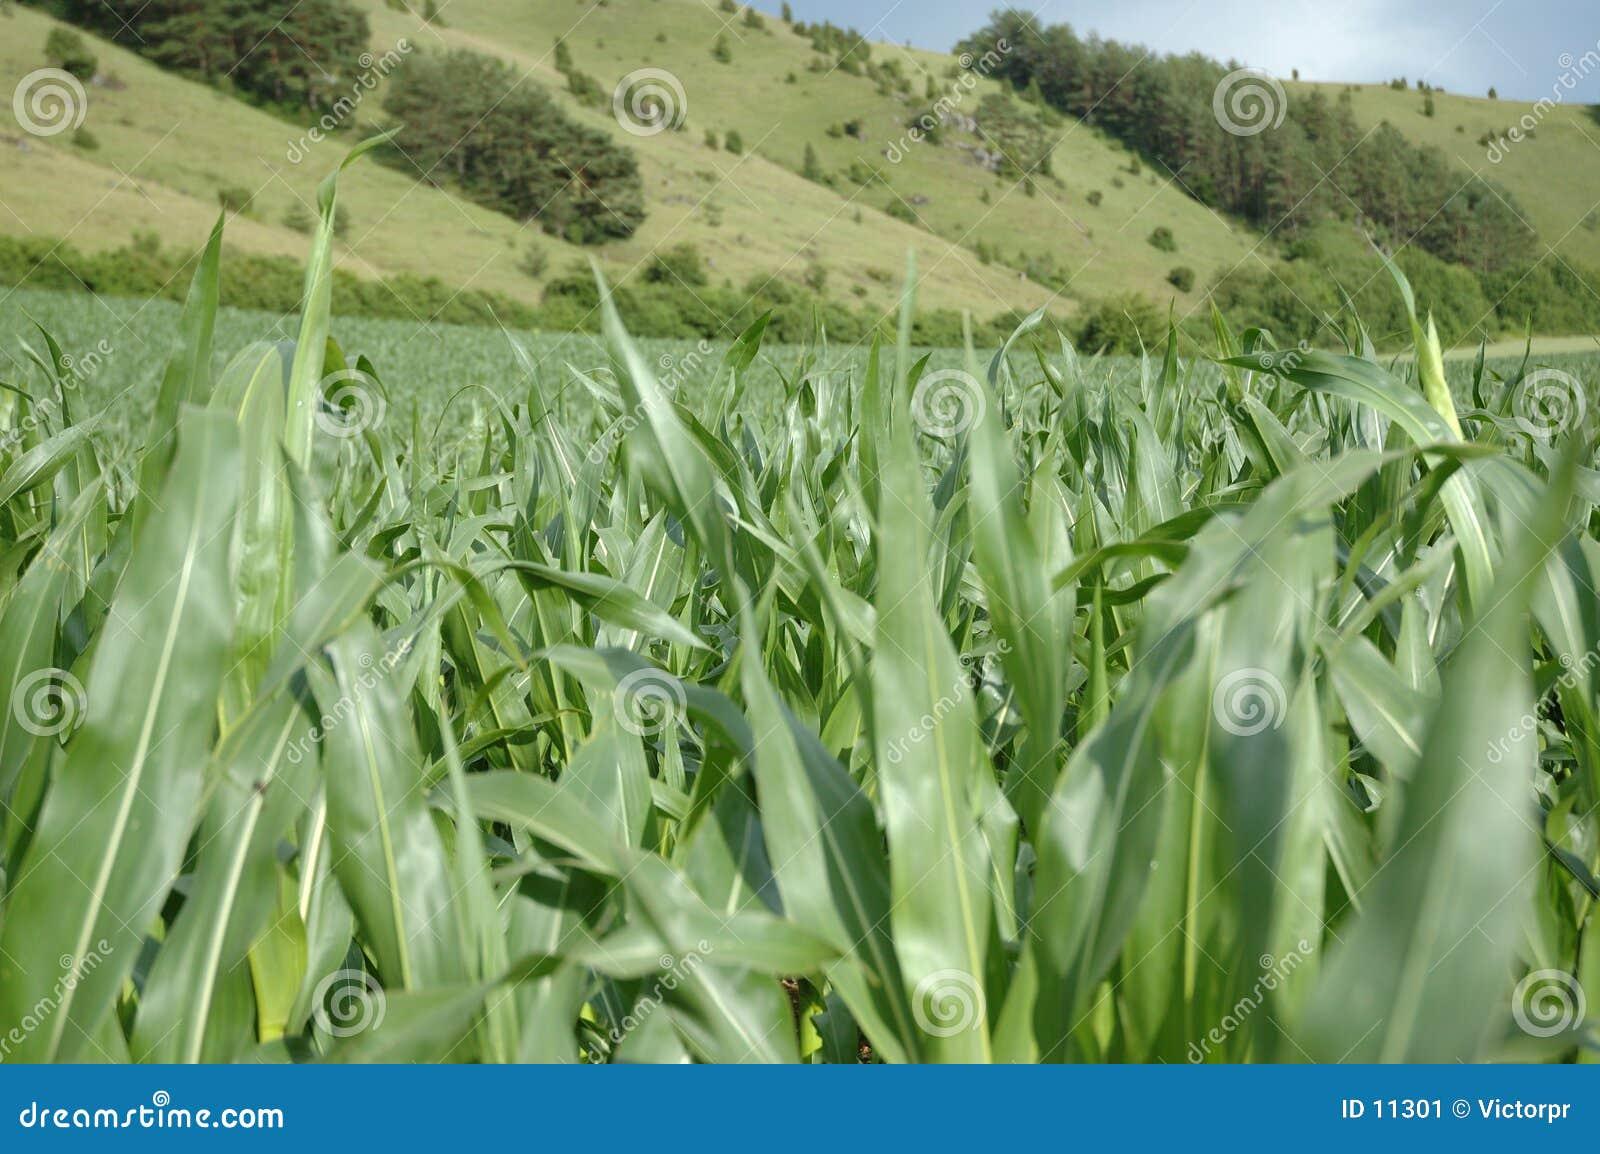 Zone de maïs